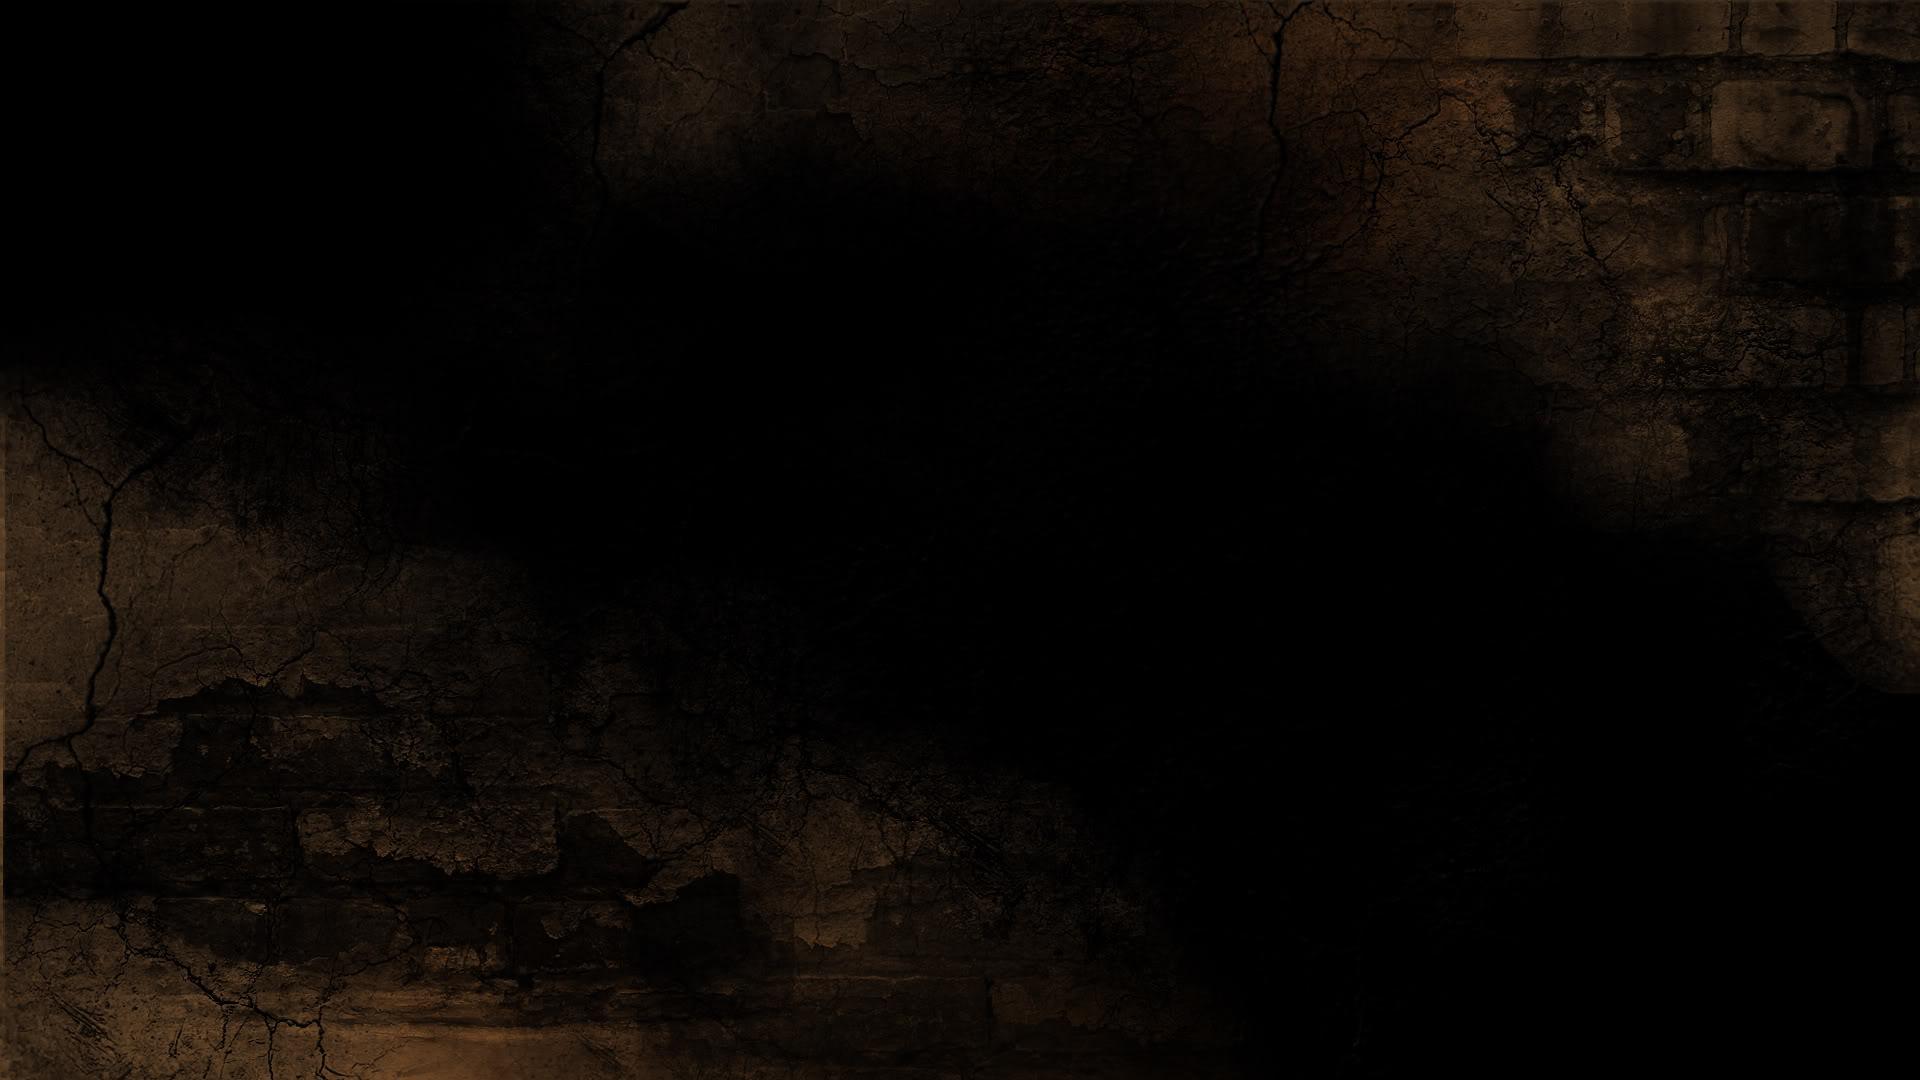 Brick Hd Wallpaper Background Image 1920x1080 Id